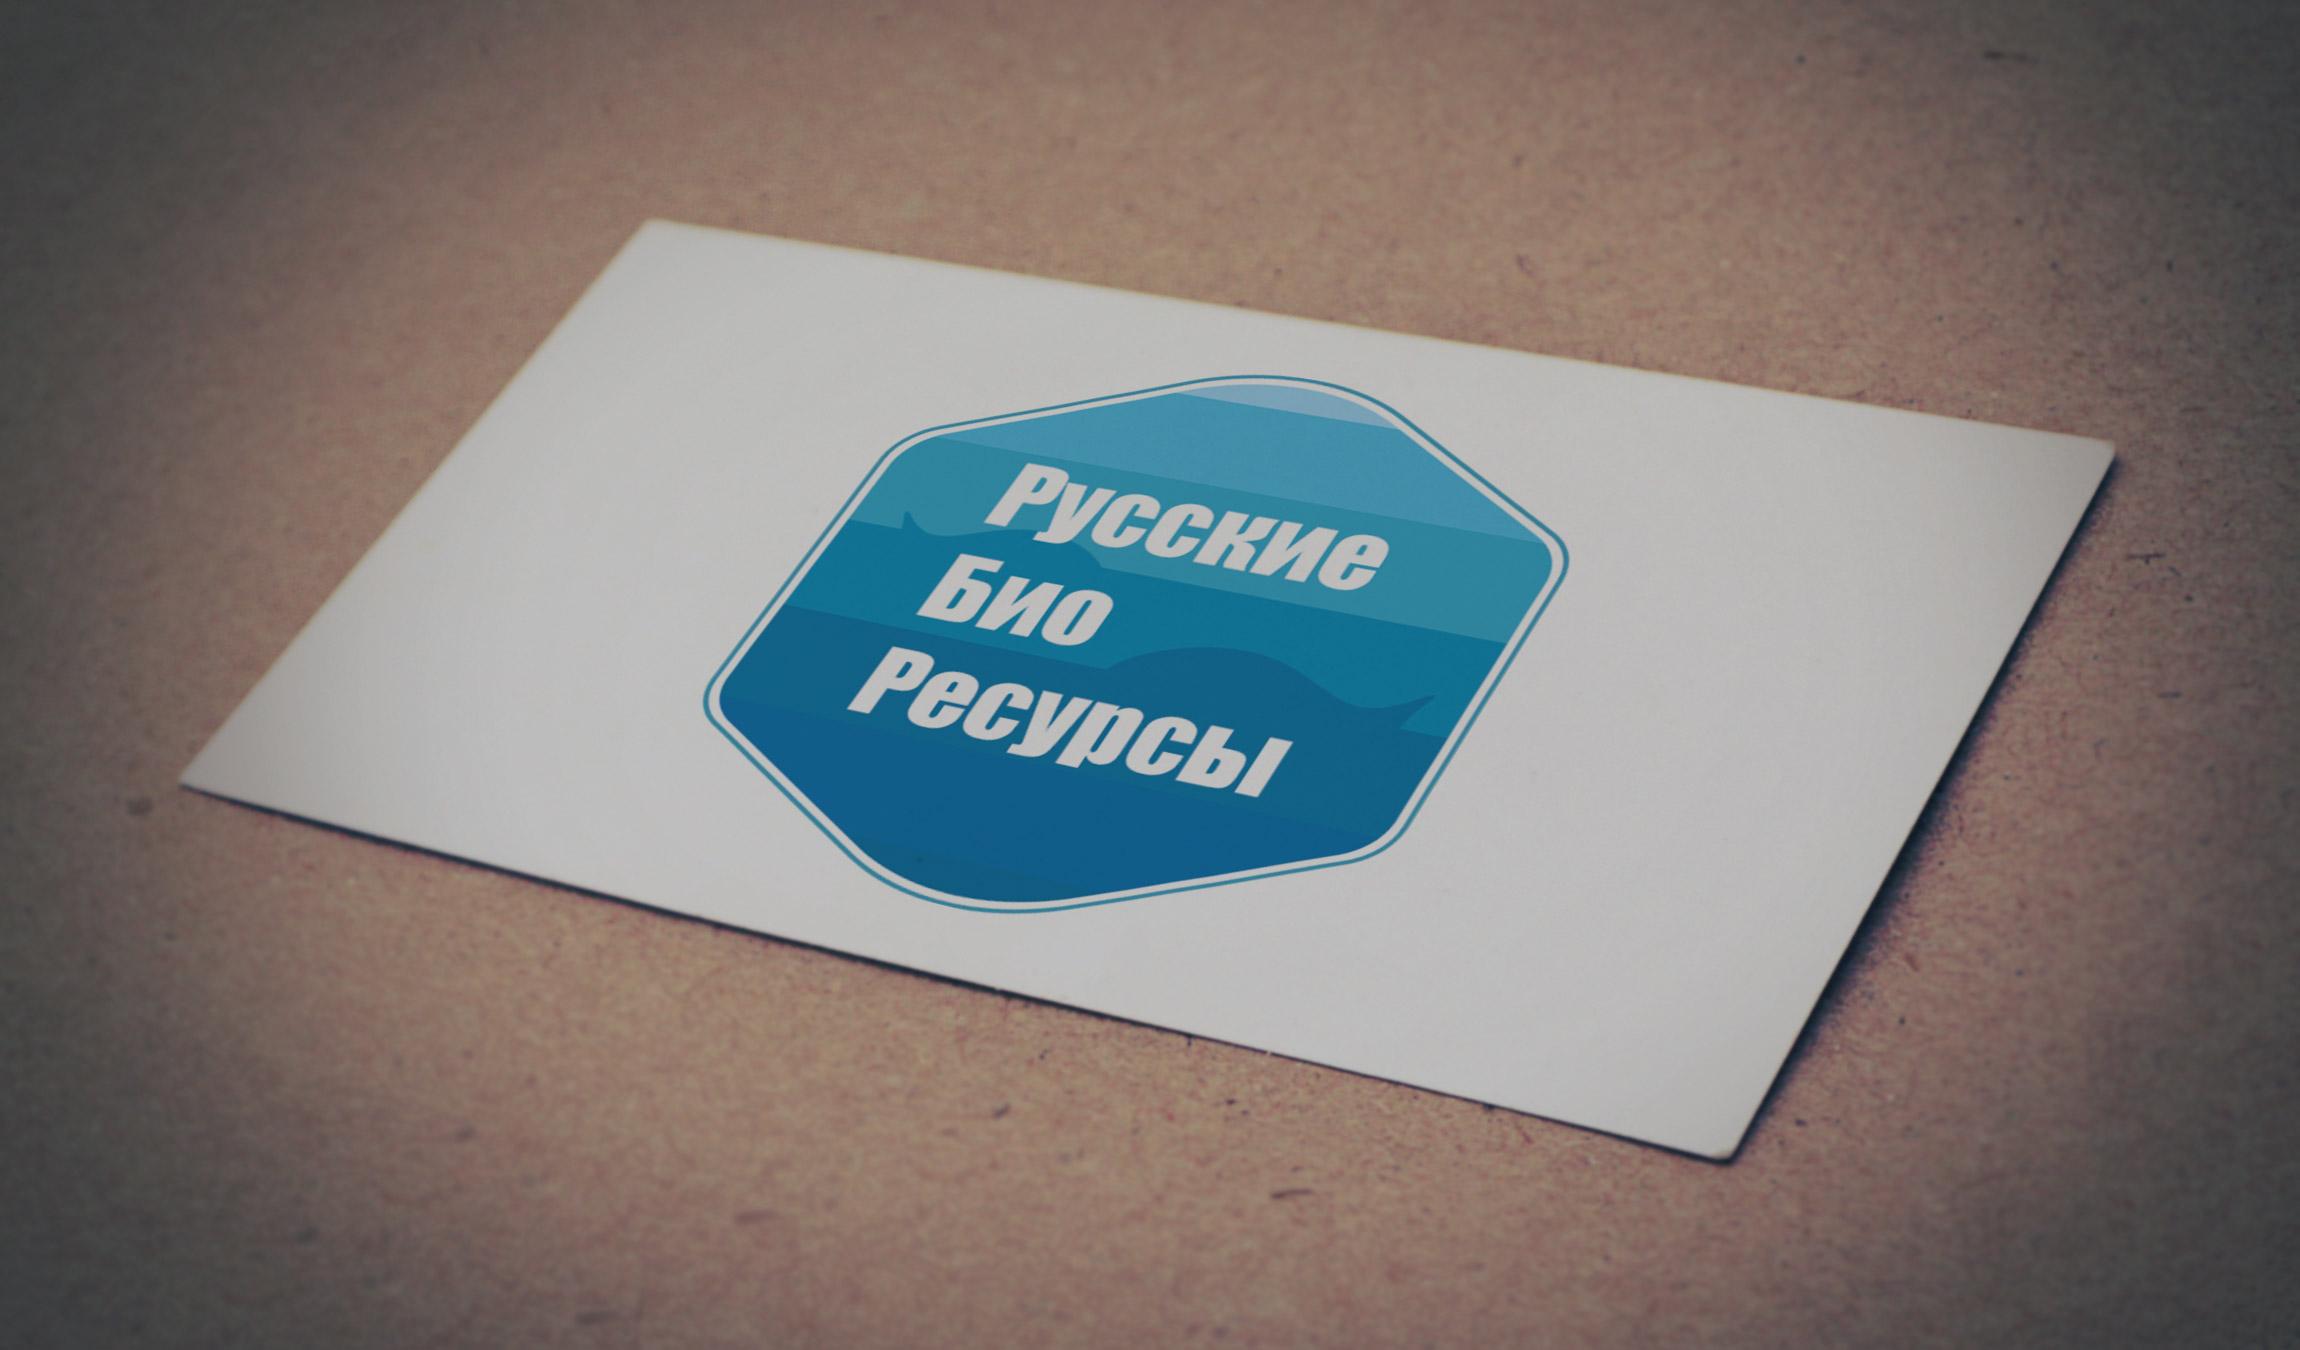 Разработка логотипа для компании «Русские Био Ресурсы» фото f_01958fa48a1b1360.jpg